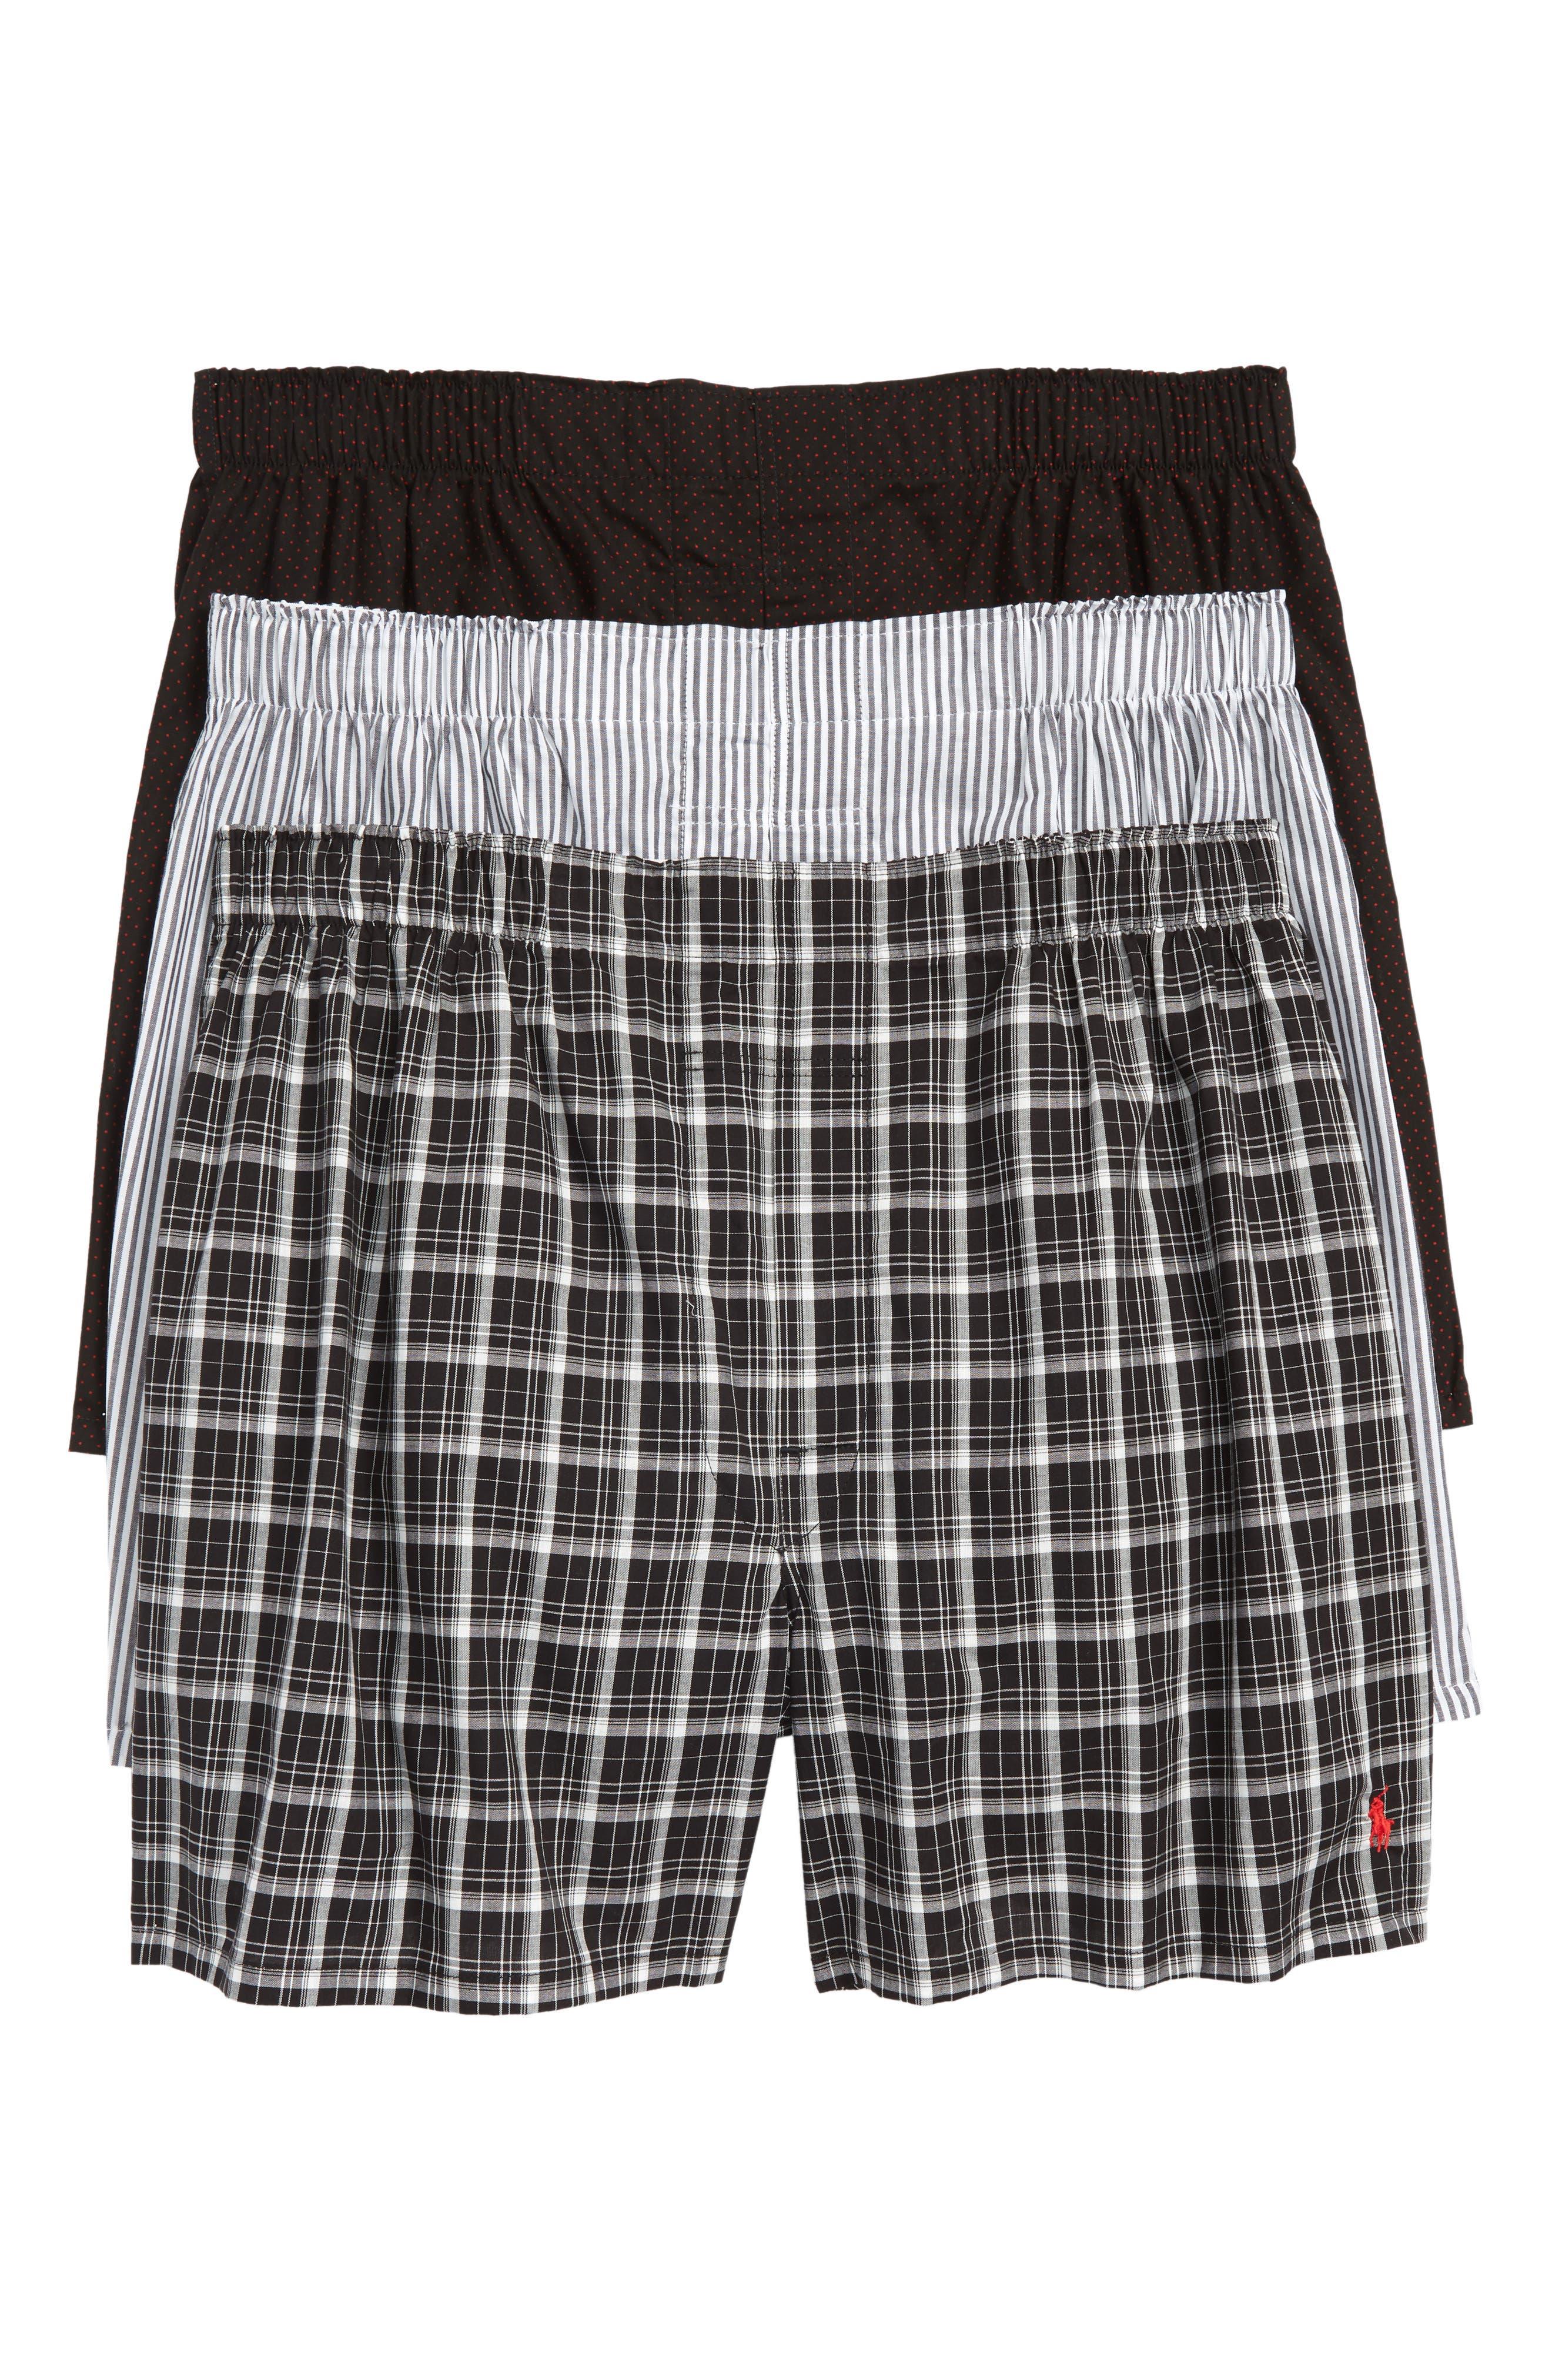 3-Pack Woven Cotton Boxers,                             Main thumbnail 1, color,                             POLO BLACK/ DOVER/ THOMAS